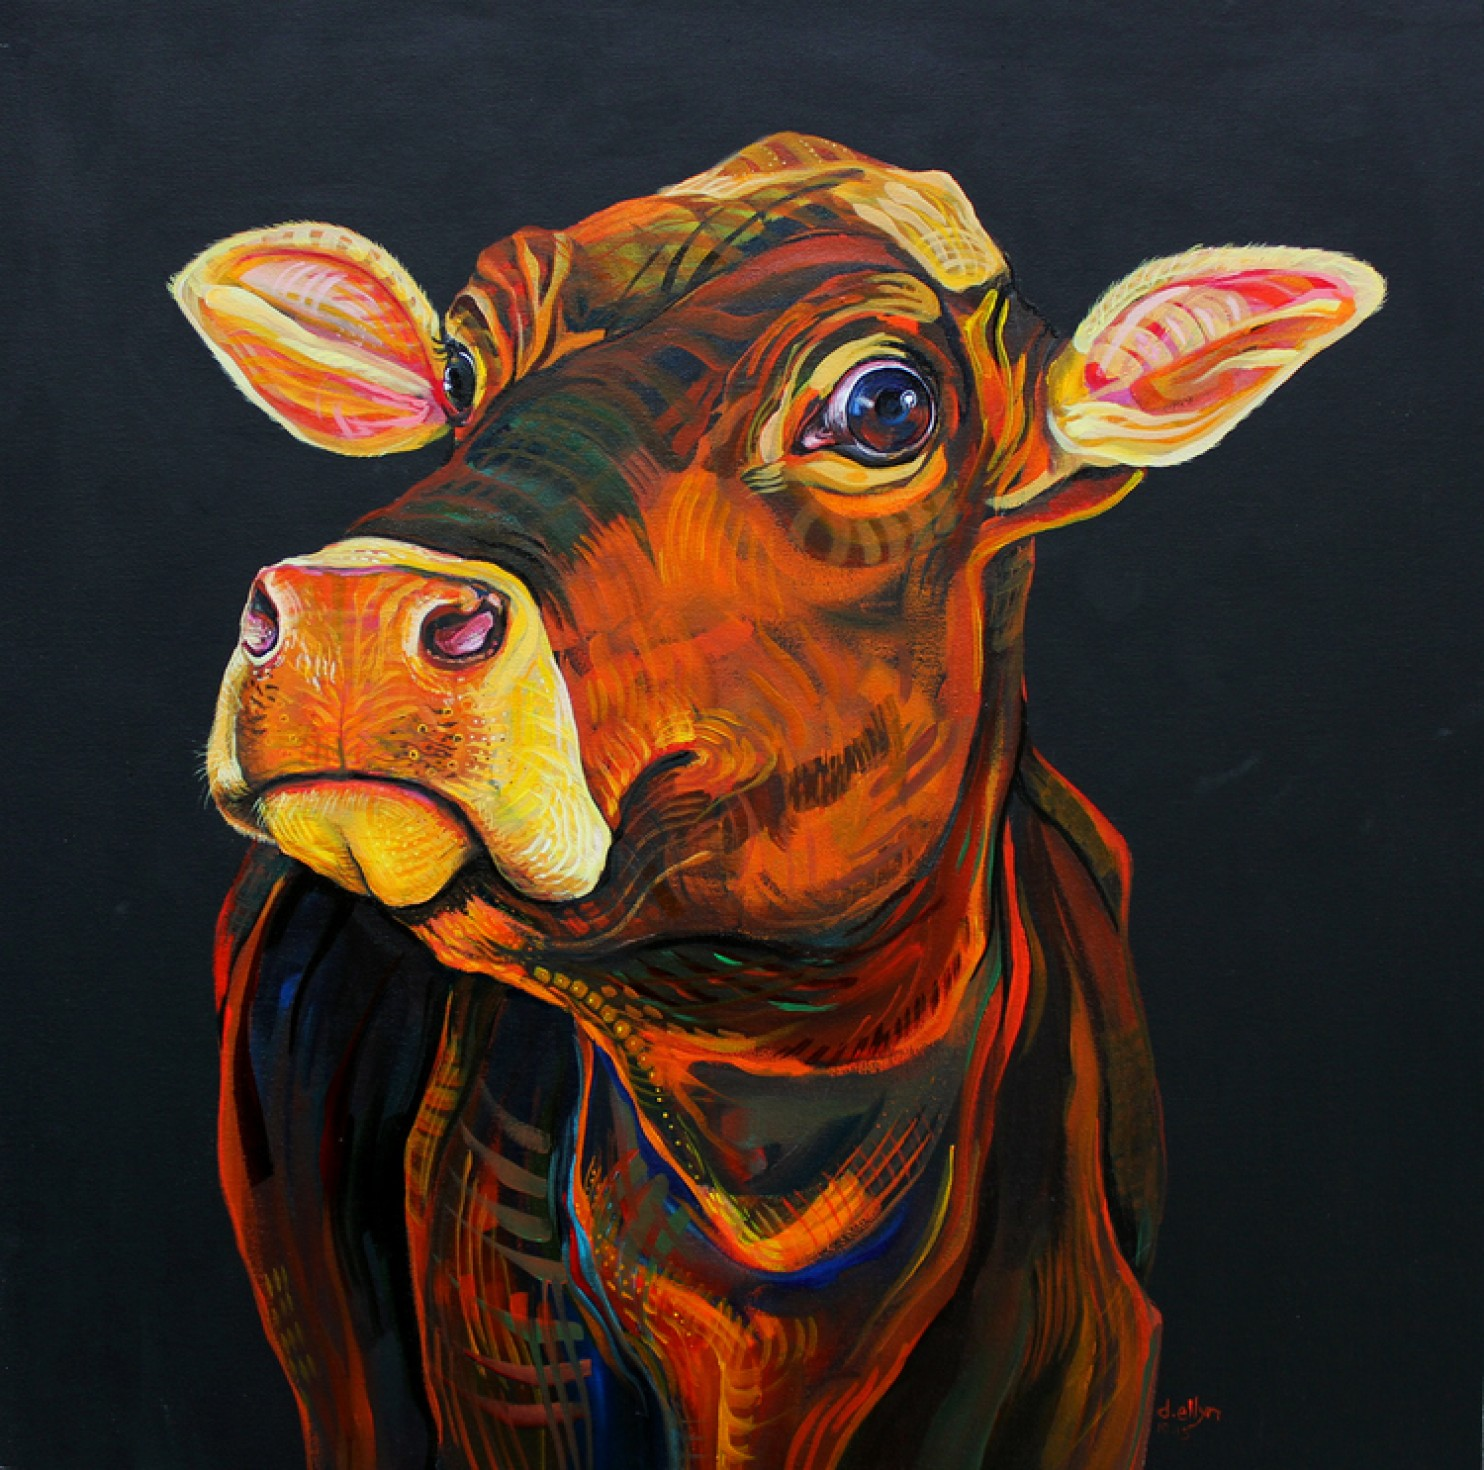 """Cow (Moo, Not Meat),"" acrylic on canvas, by Dana Ellyn"